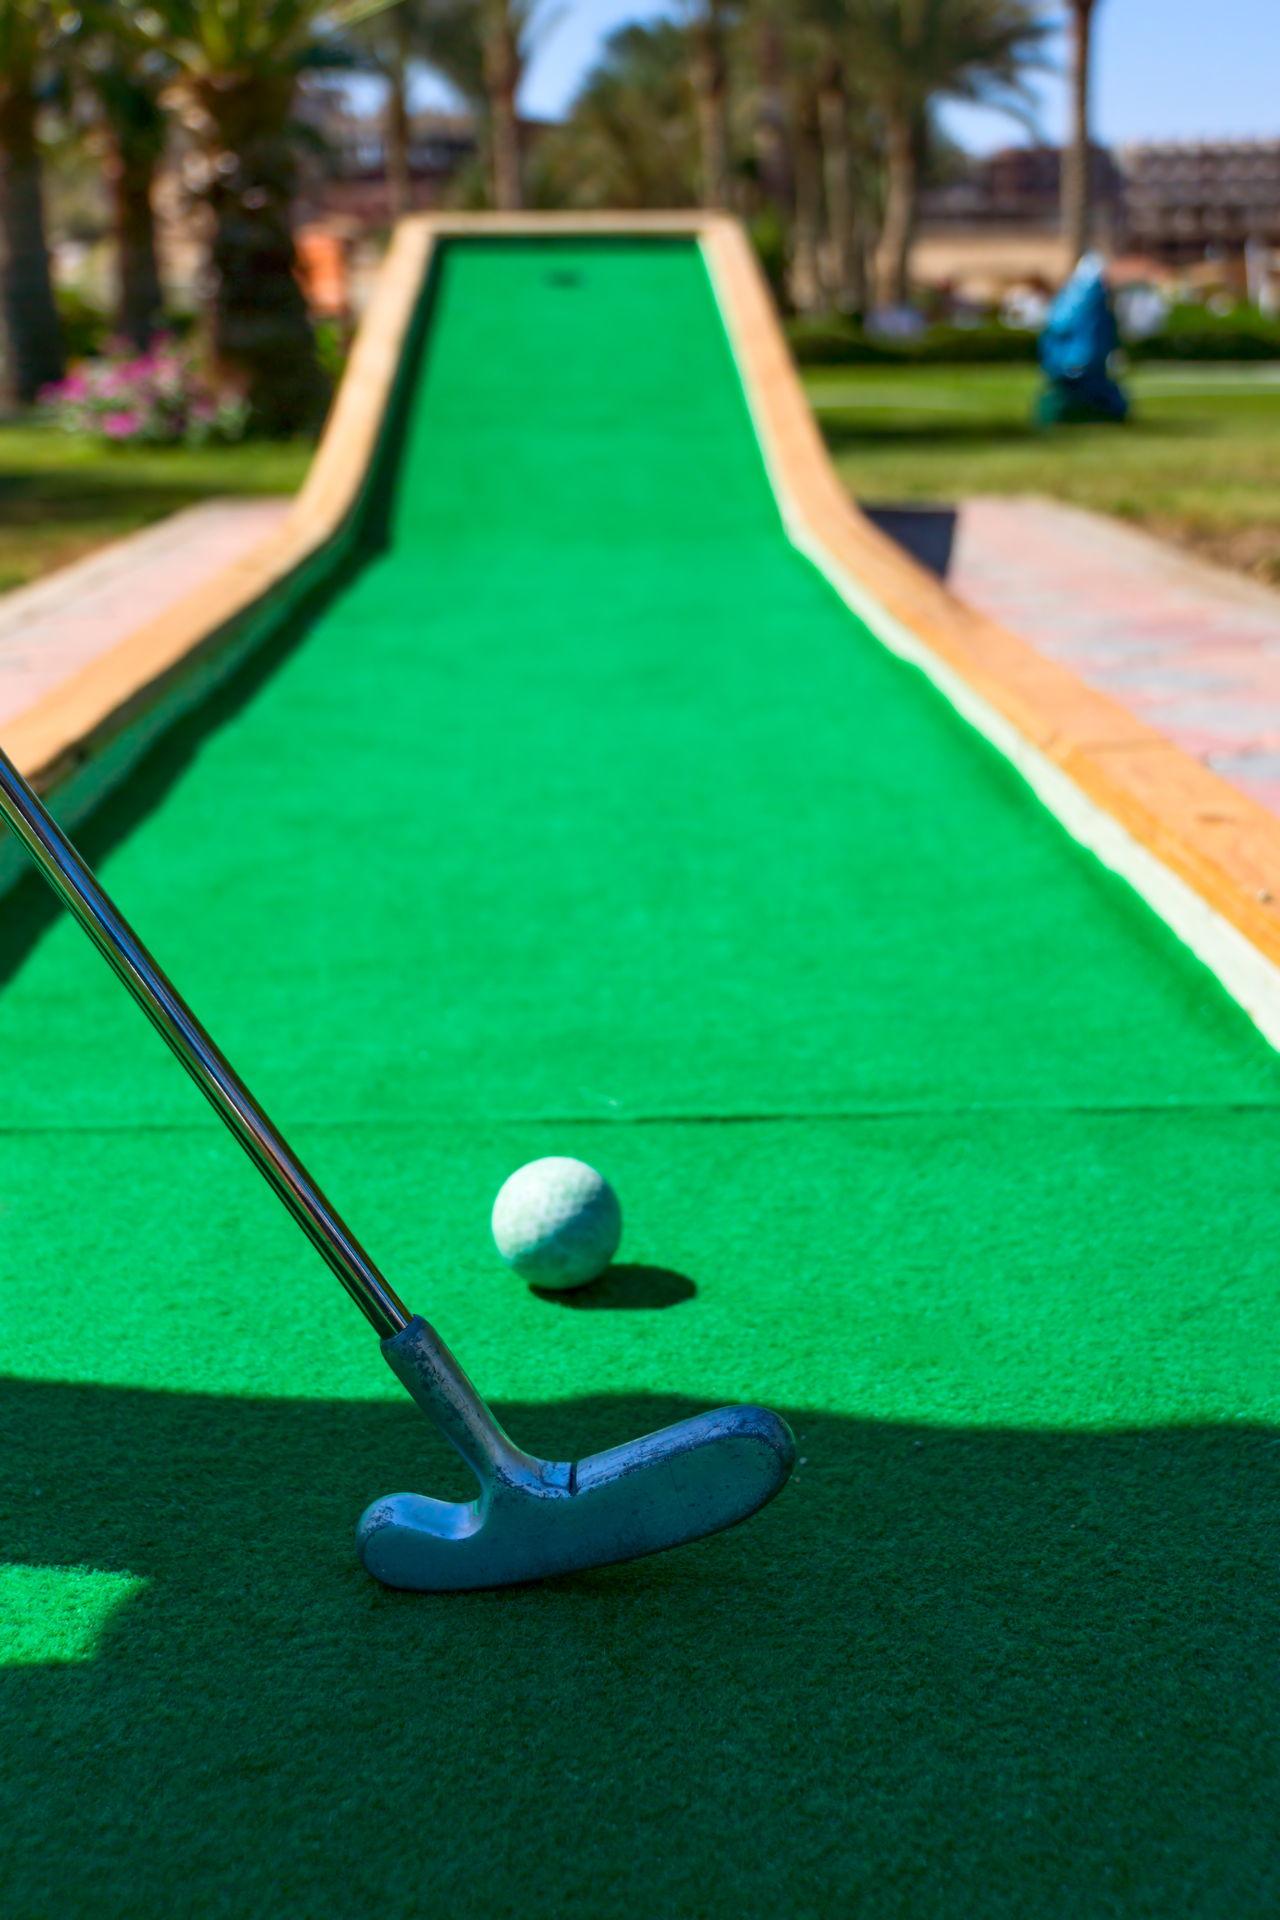 unique and entertaining golf tournament ideas